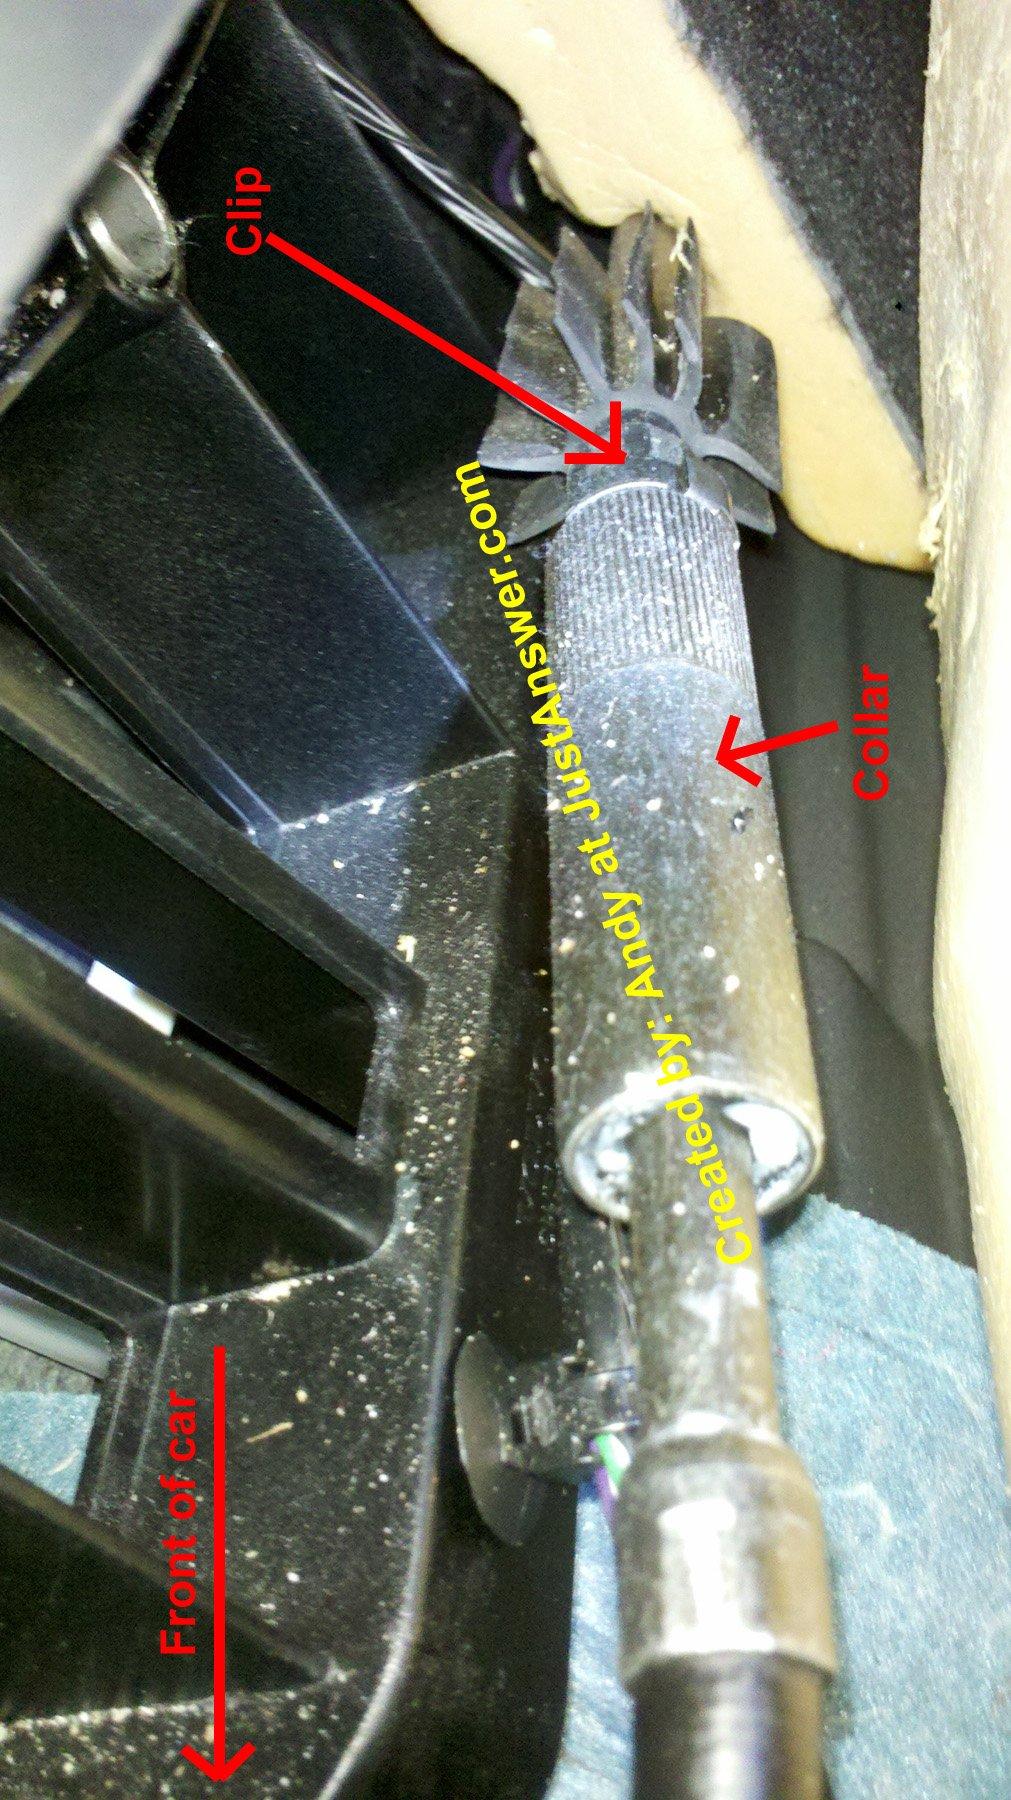 Volvo S60: Brake pad inspection